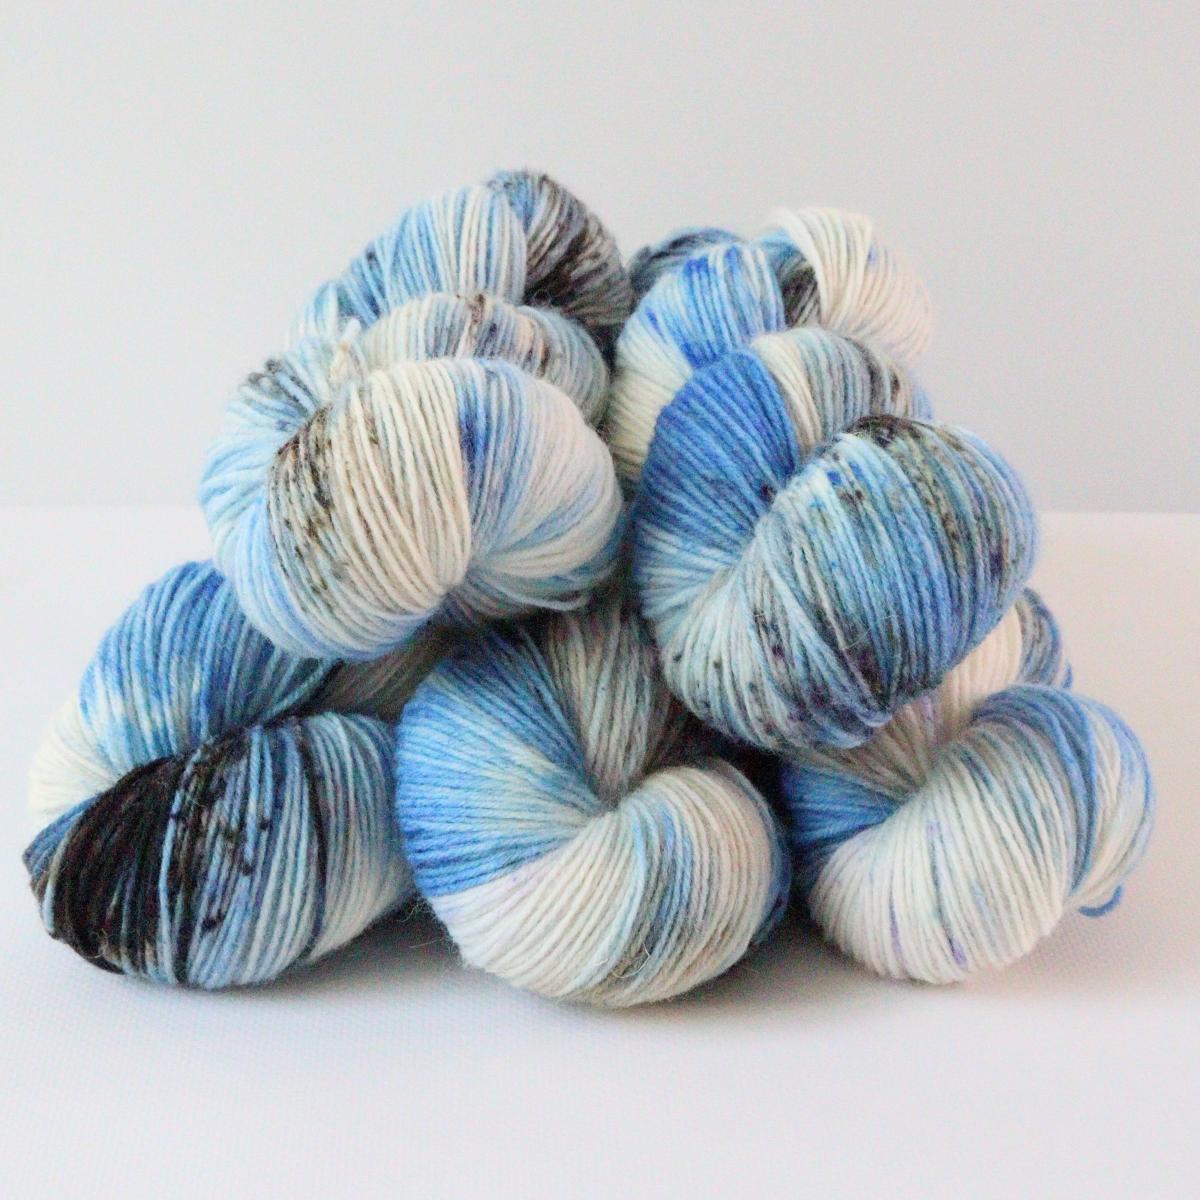 woodico.pro hand dyed yarn 081 1200x1200 - Hand dyed yarn / 081